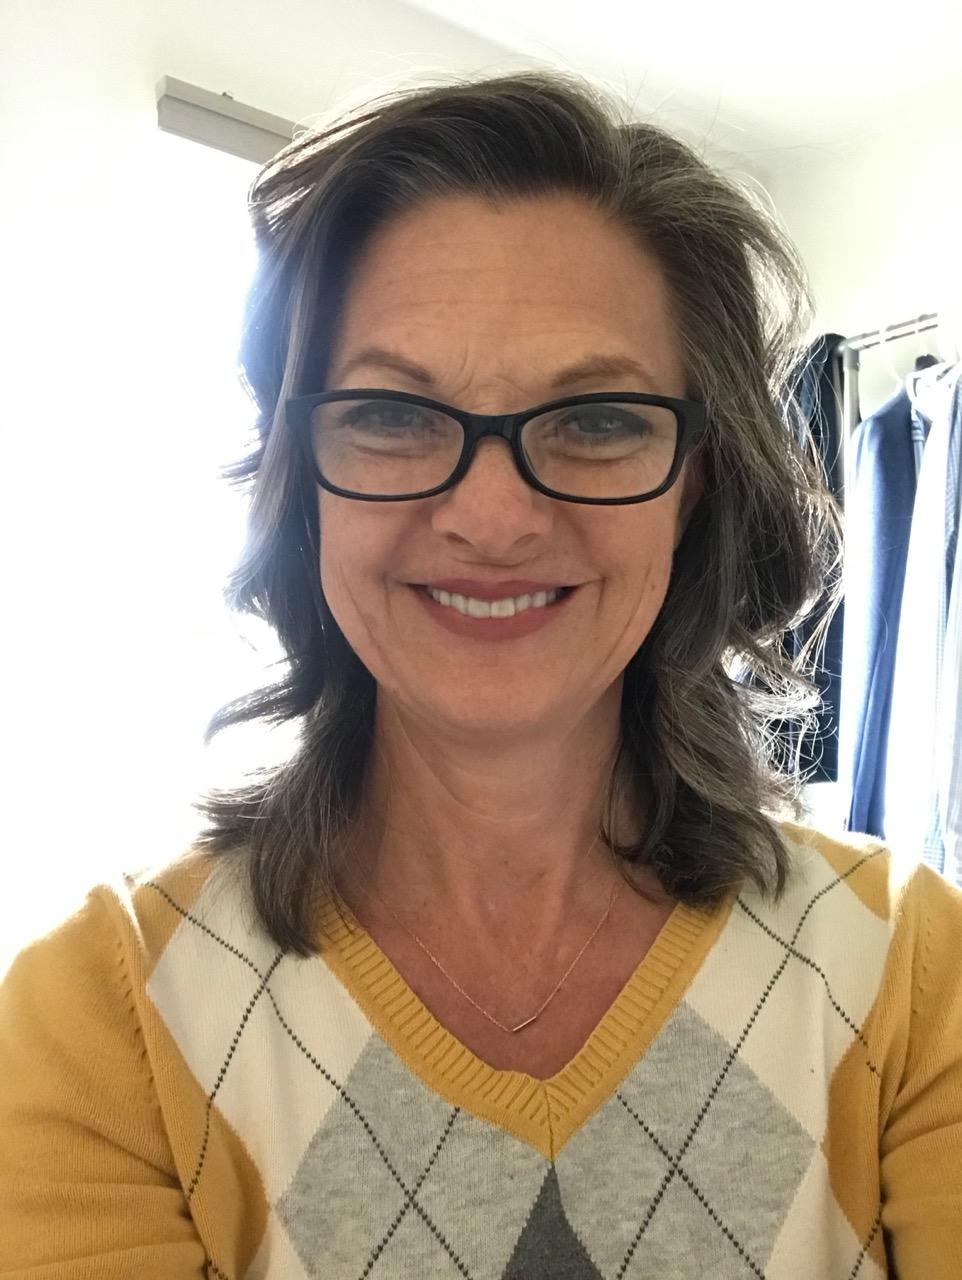 Kristin Shaeffer, music teacher extraordinaire